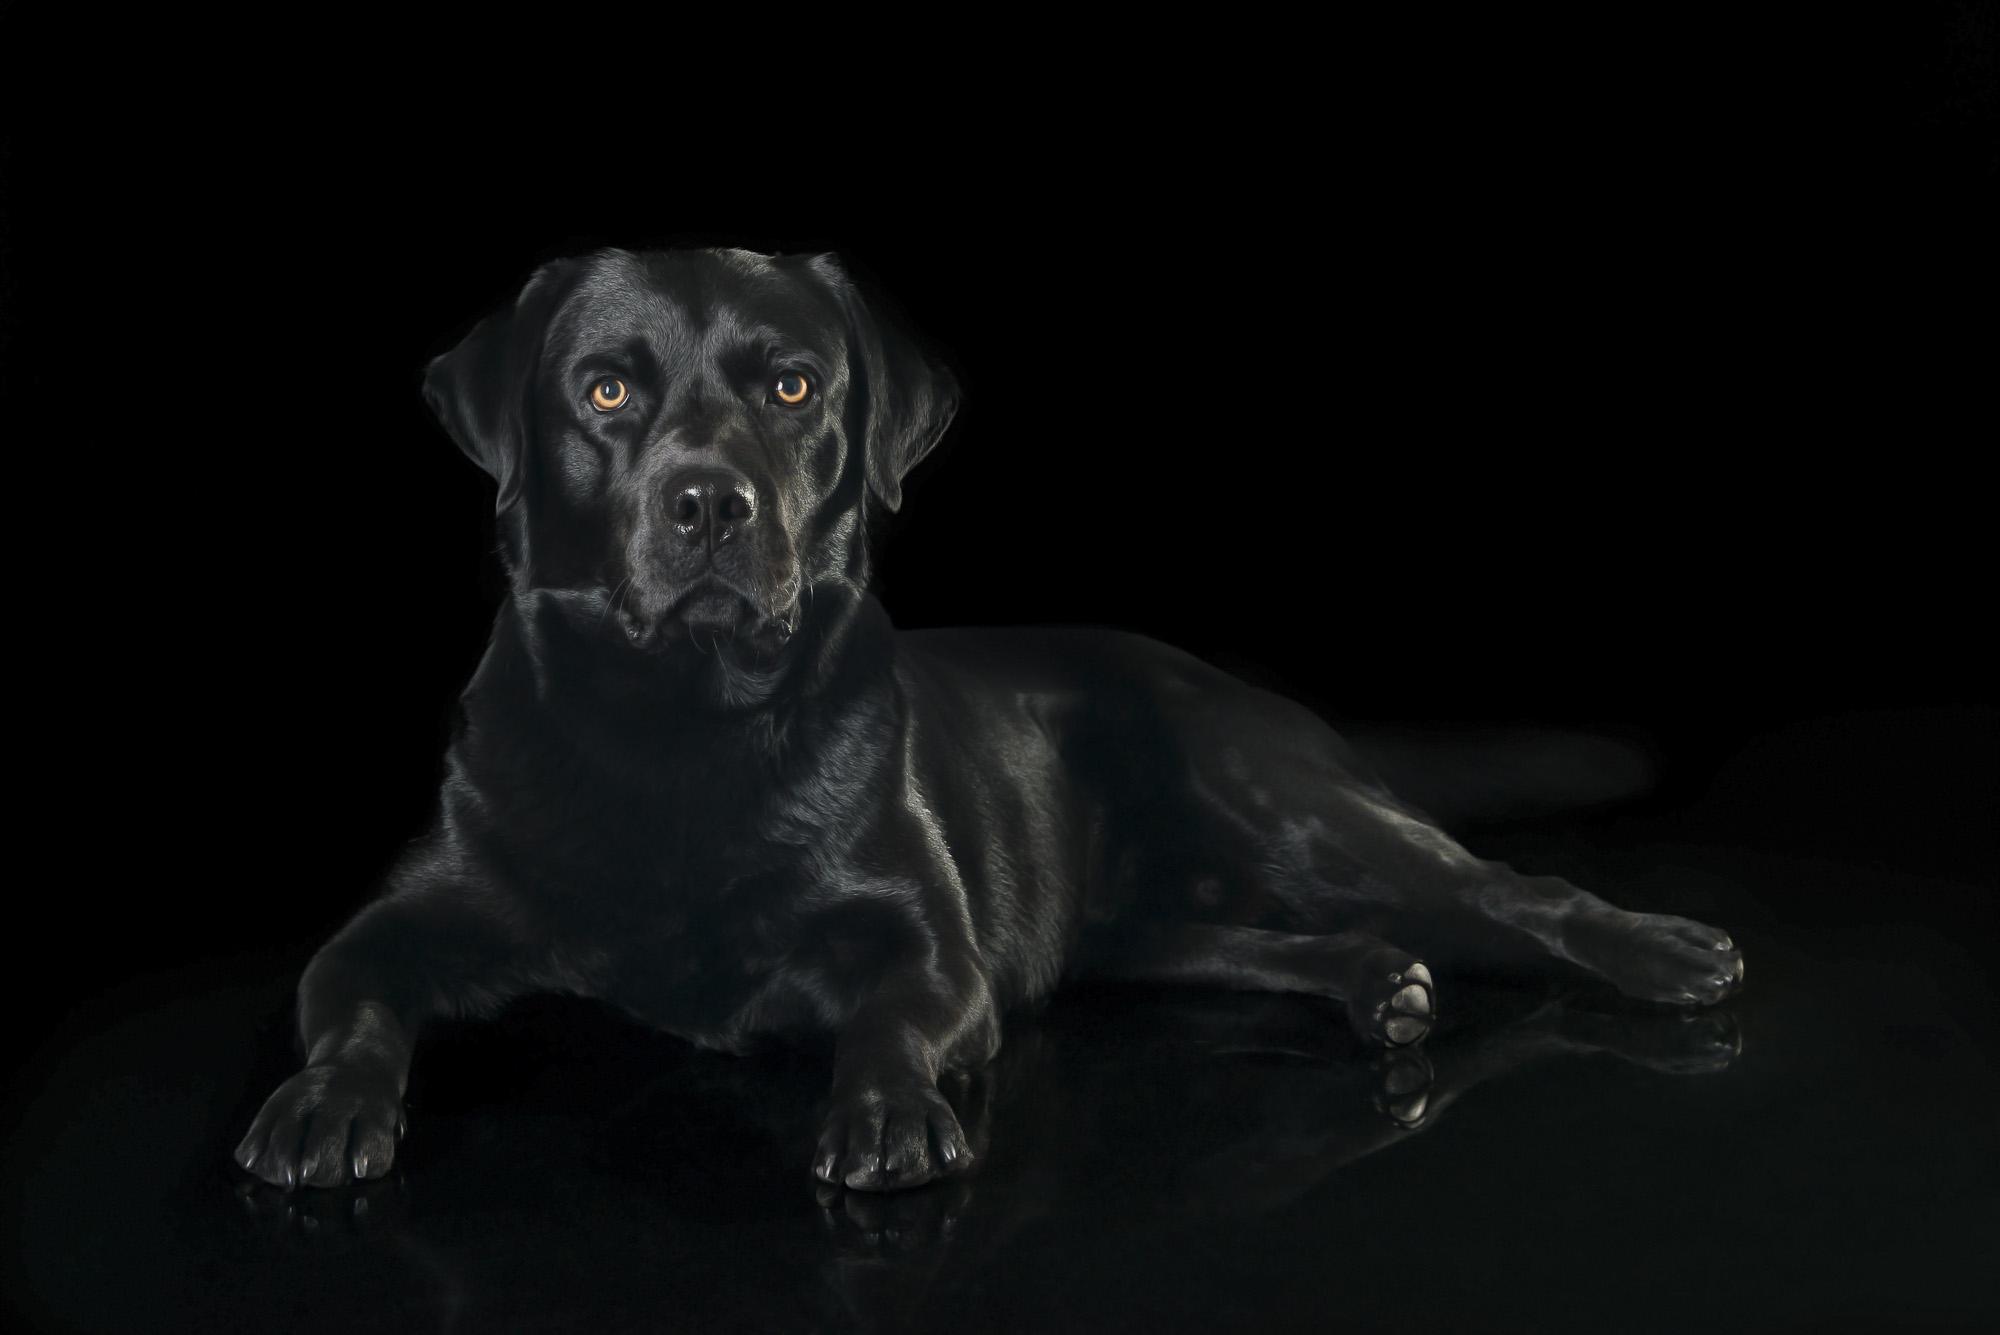 LupinBay-Black-Labrador-Retriever-Dog-Photography-0154-4904.jpg